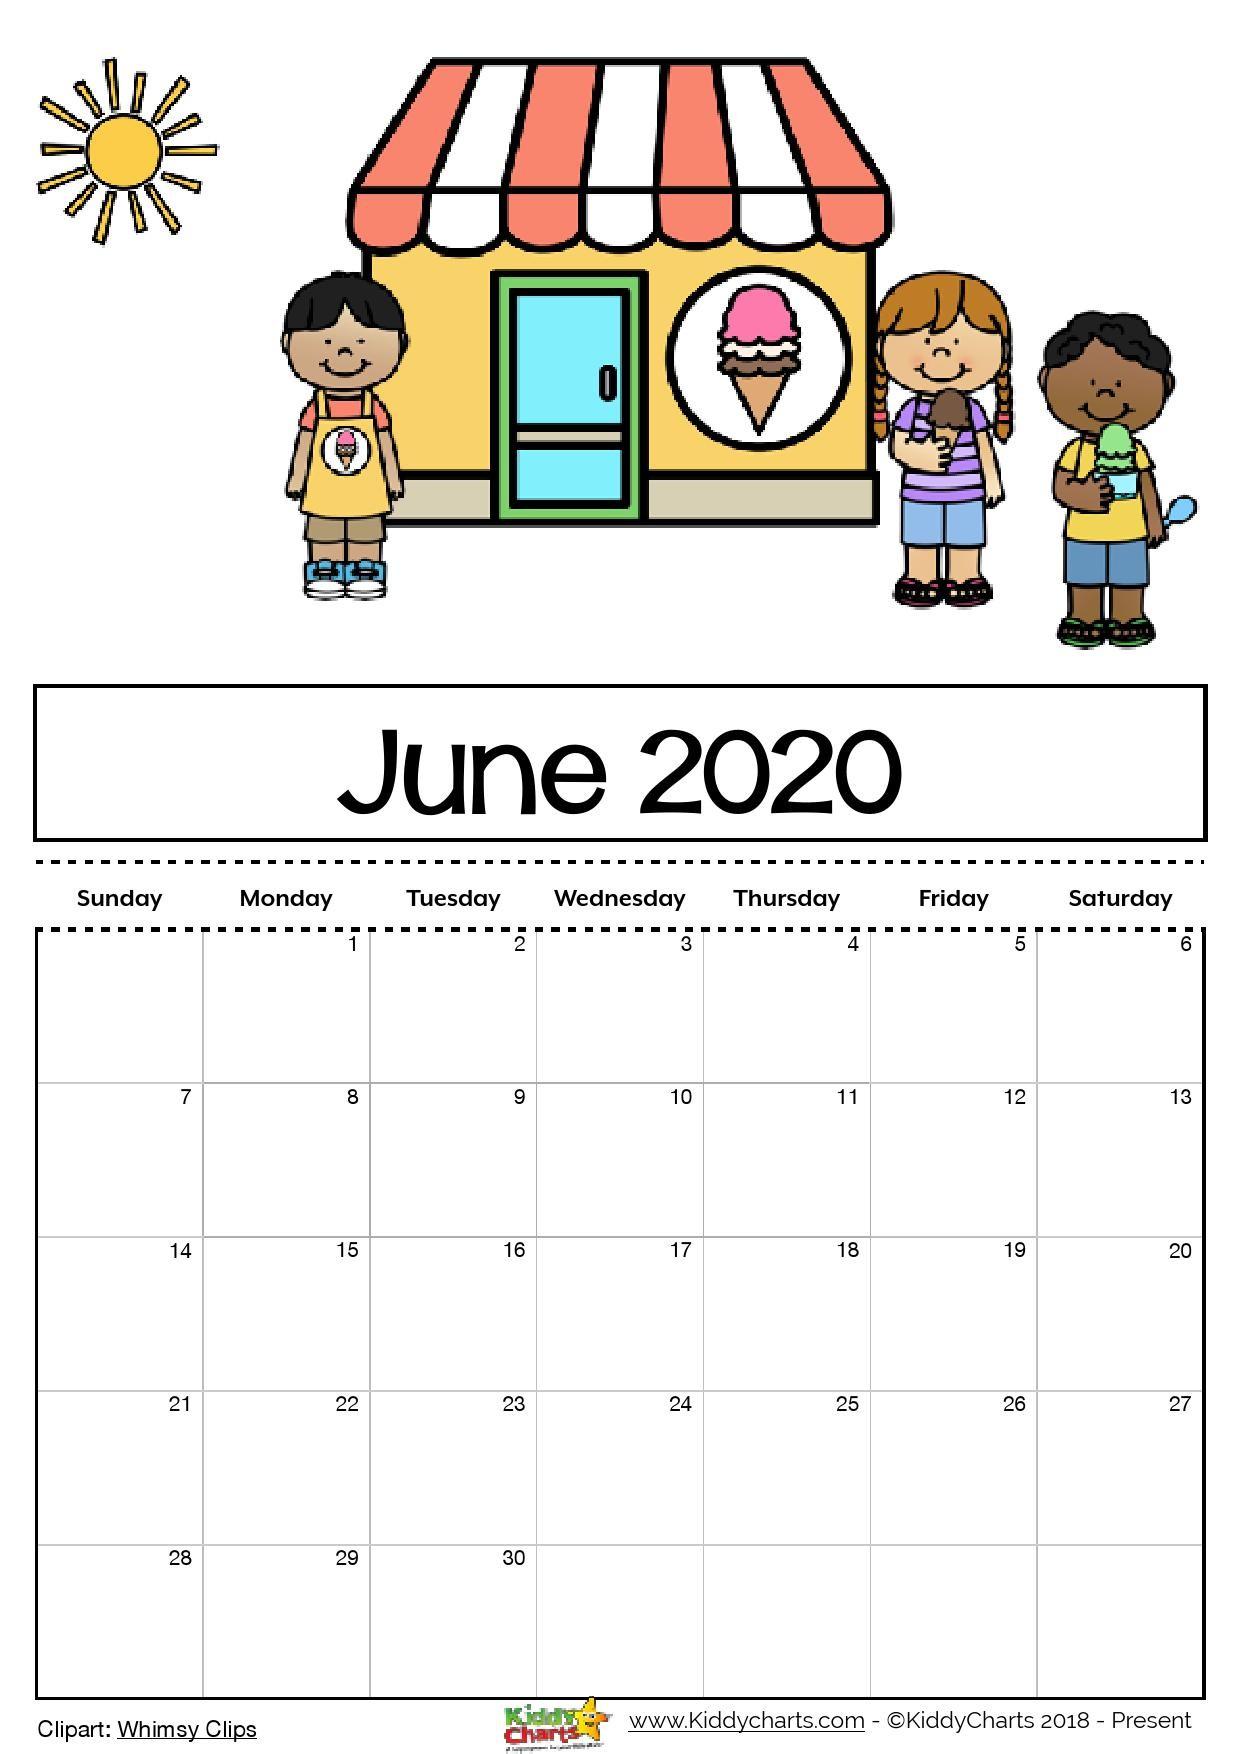 Free Printable 2020 calendar for kids including an